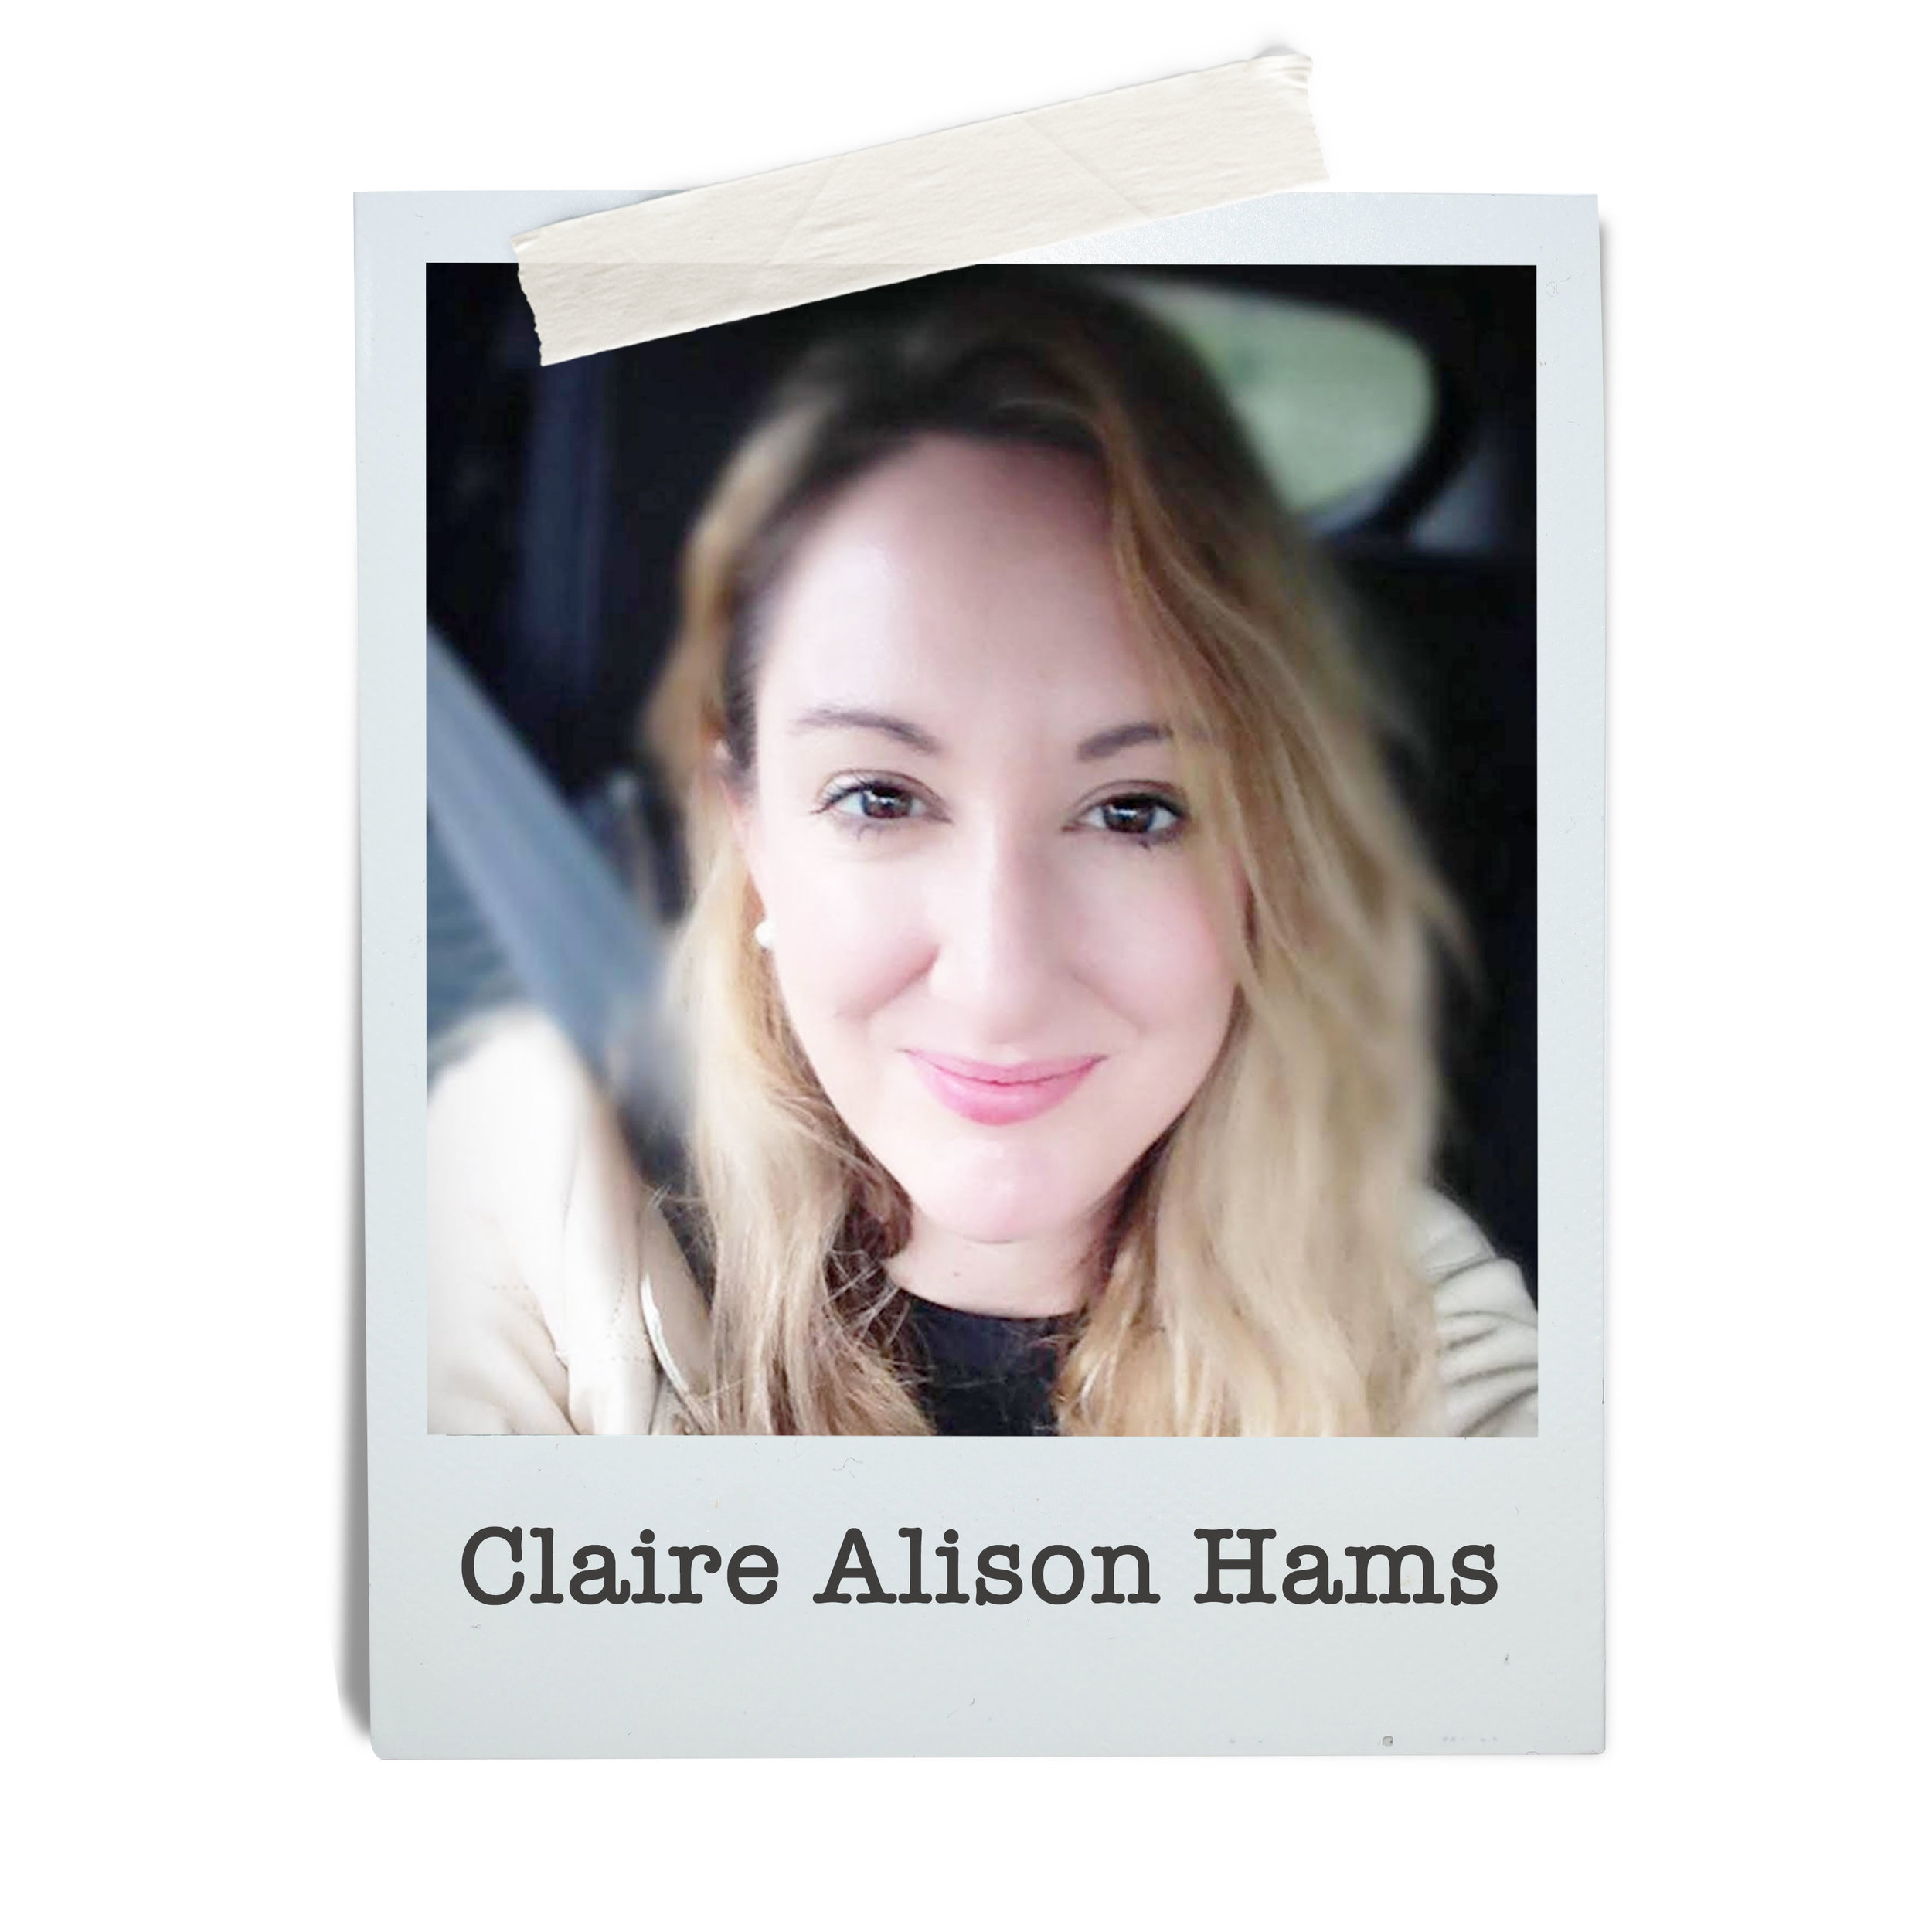 Claire Alison Hams